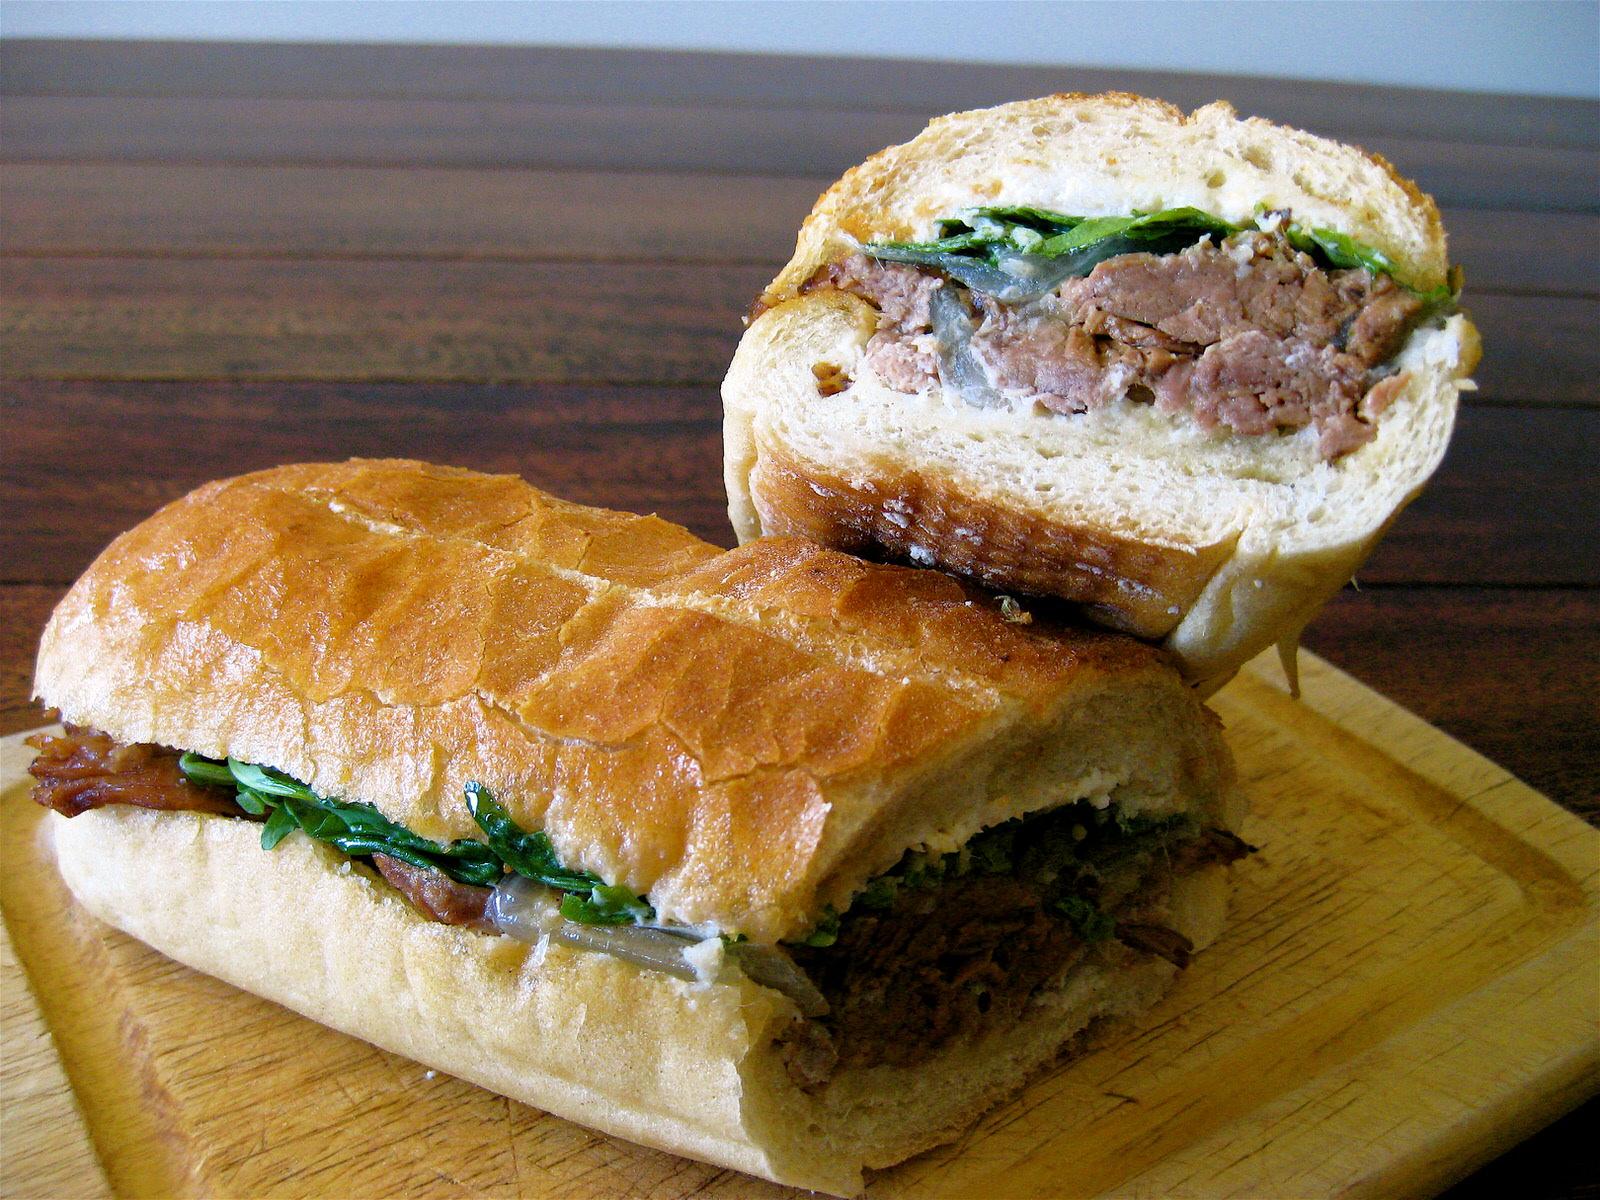 Sandwich Spotting Los Angeles ~ the #1 Slow Cooked Brisket sandwich @ Tamarind Ave Deli